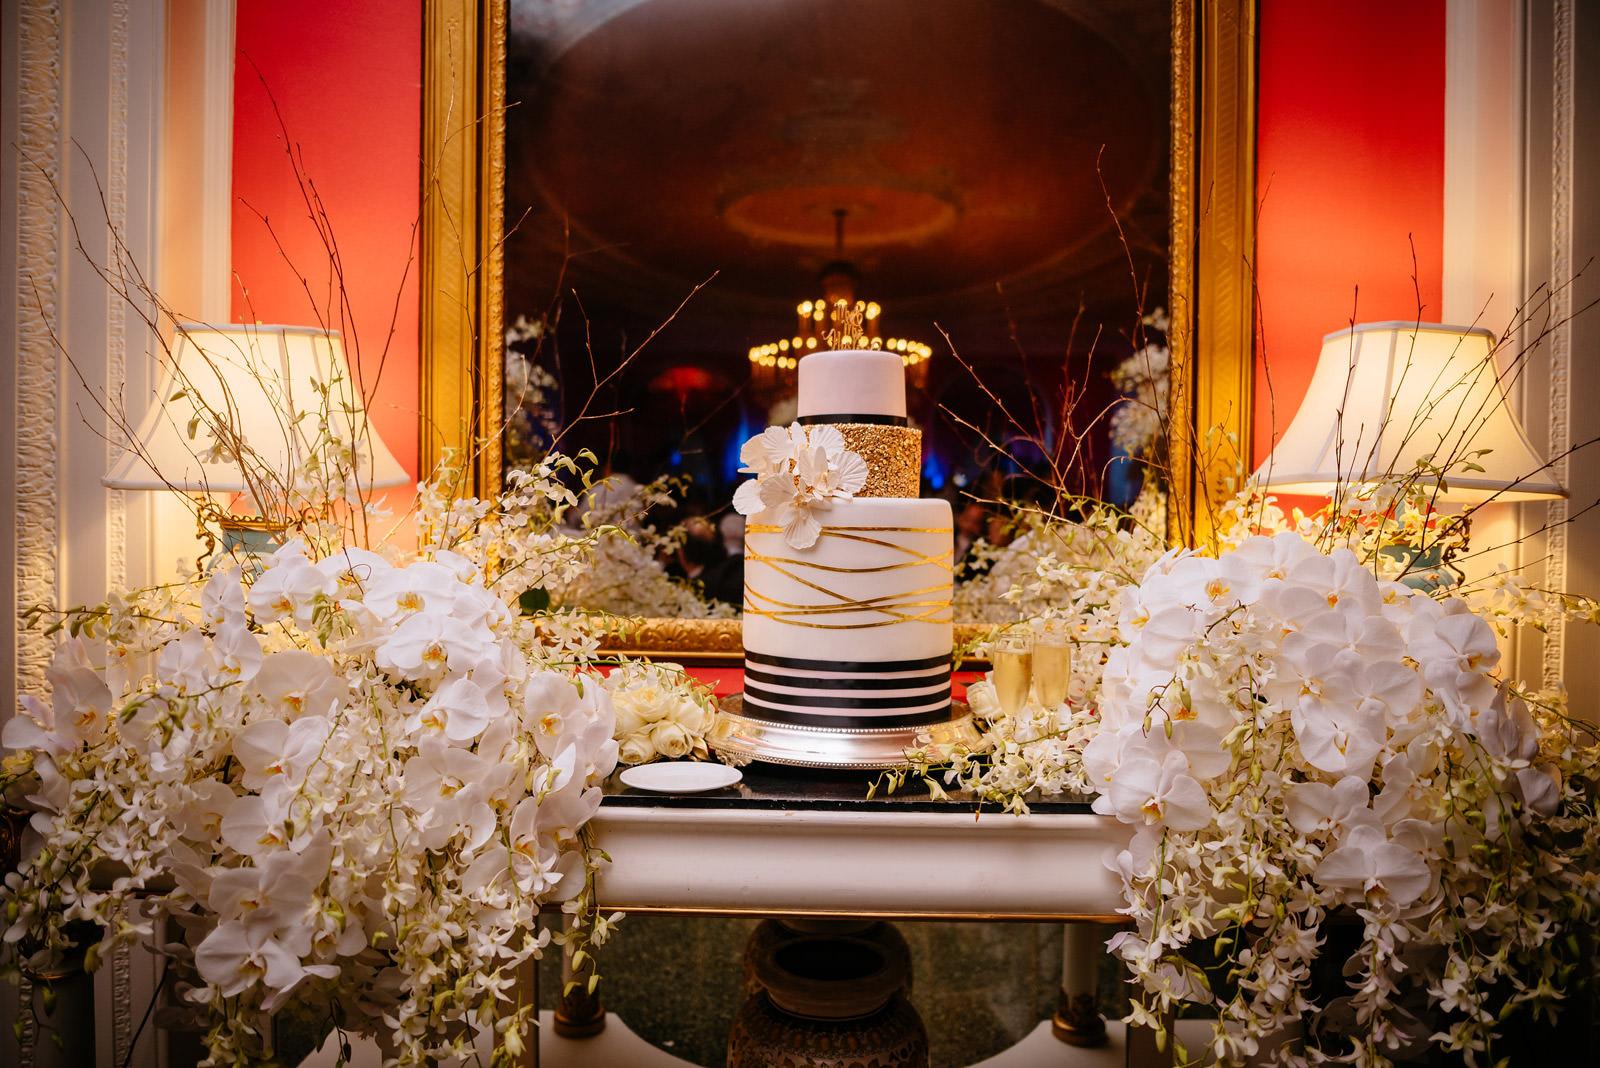 greenbrier resort wedding cake